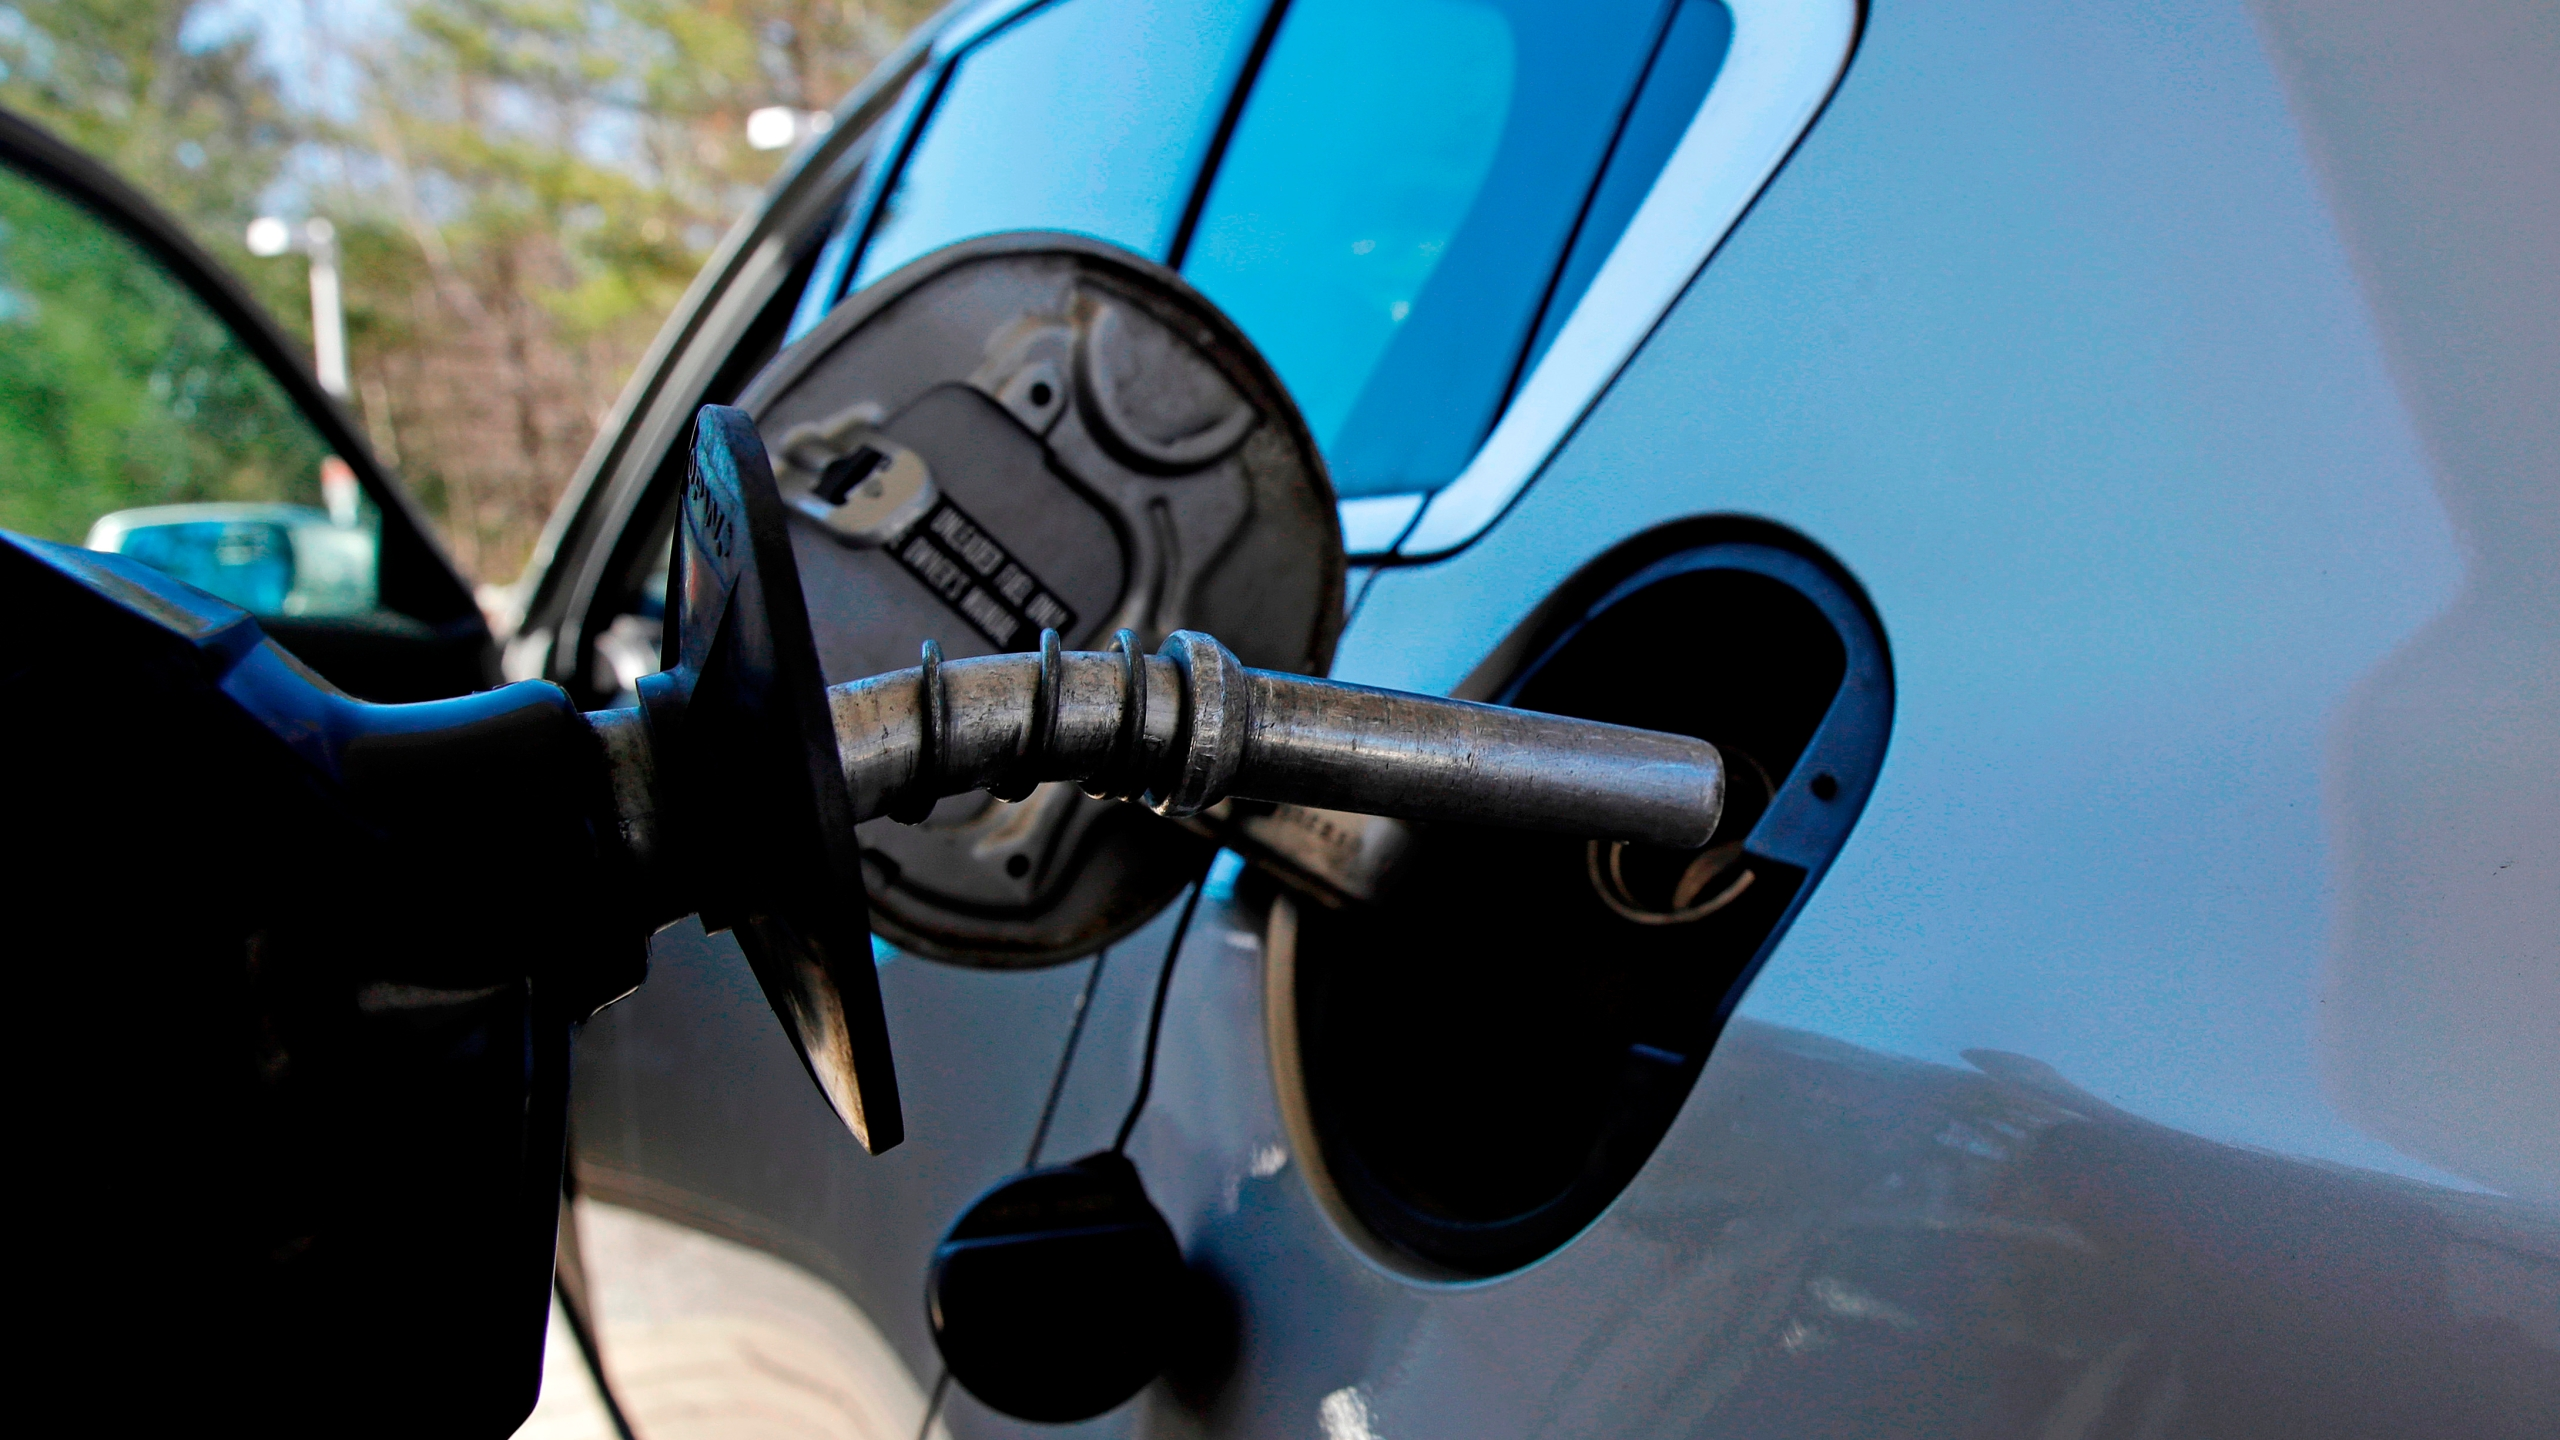 Rising_Gasoline_Prices_83542-159532.jpg28547178